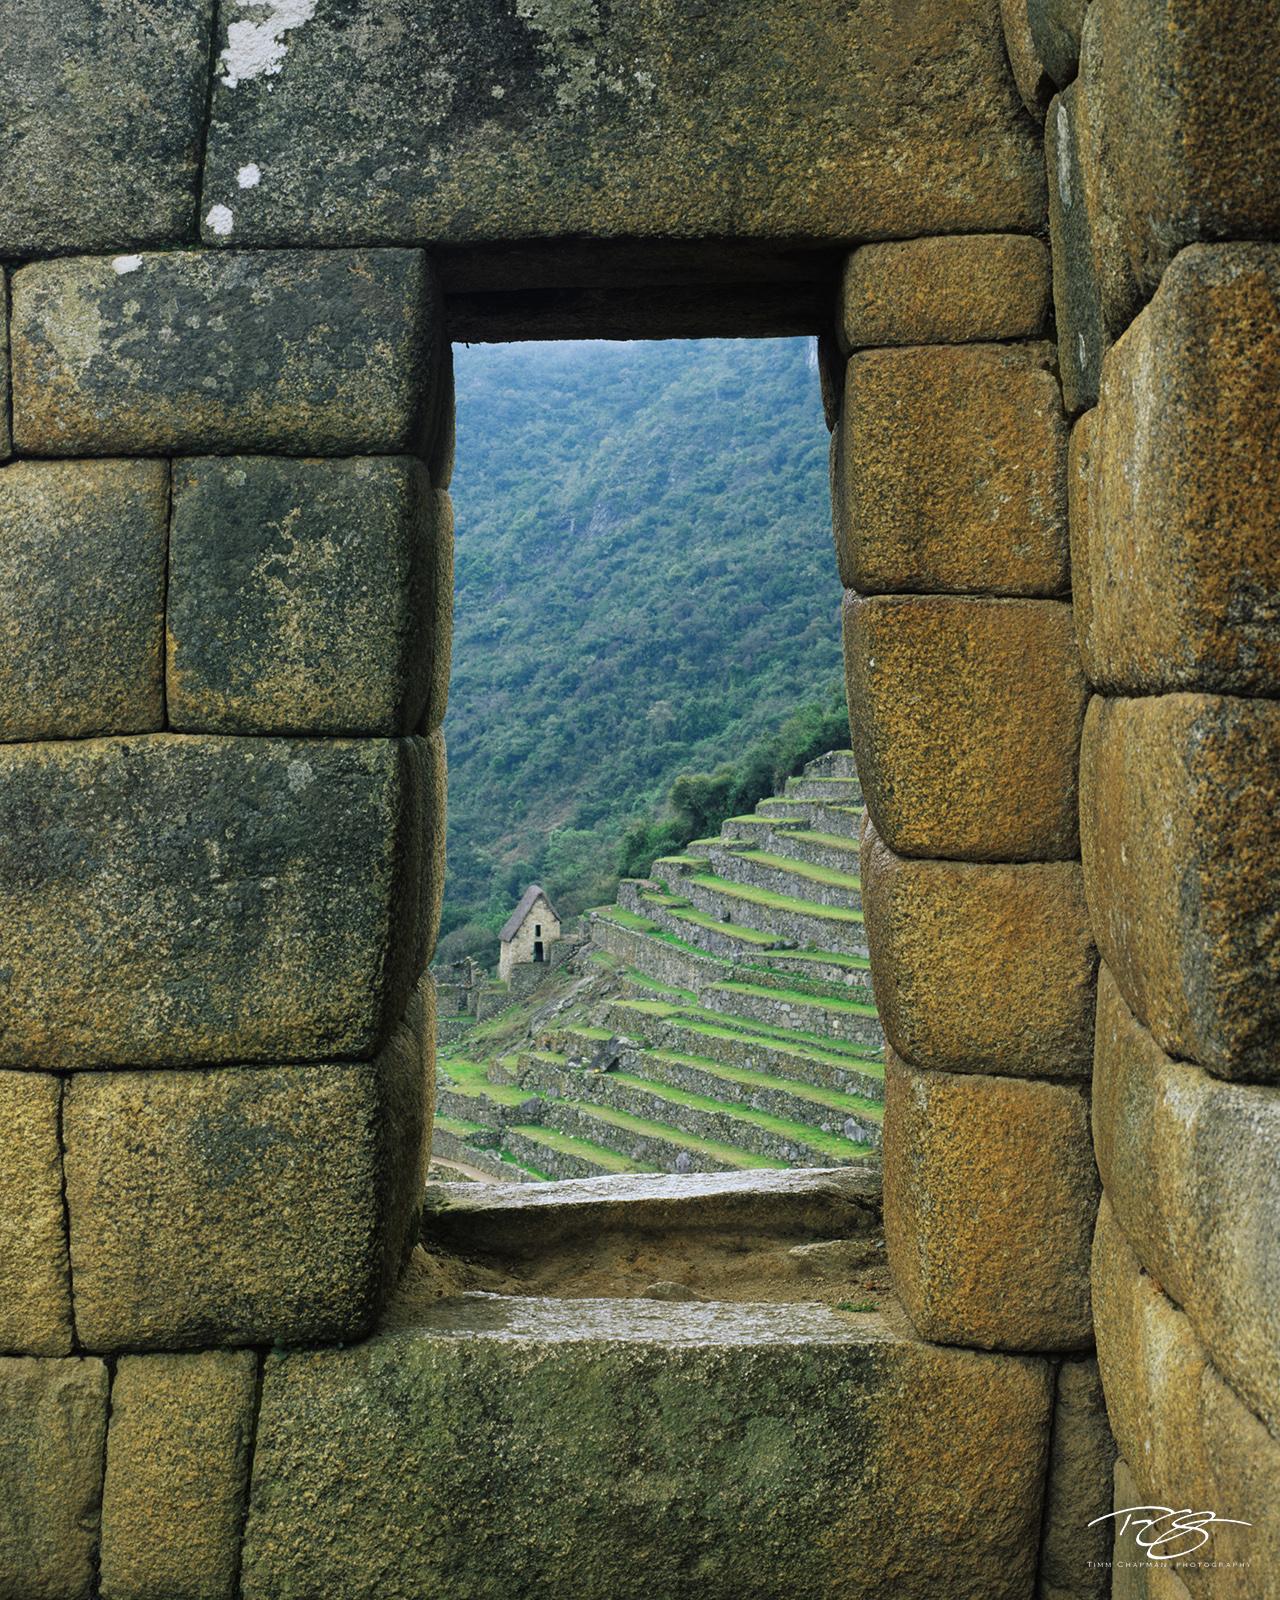 machu picchu, inca trail, terraces carved stone, stone window, intihuatana, lost city, lost city of the incas, hiram bingham, urubamba valley, stone work, hand carved stone, window on the world, ancie, photo